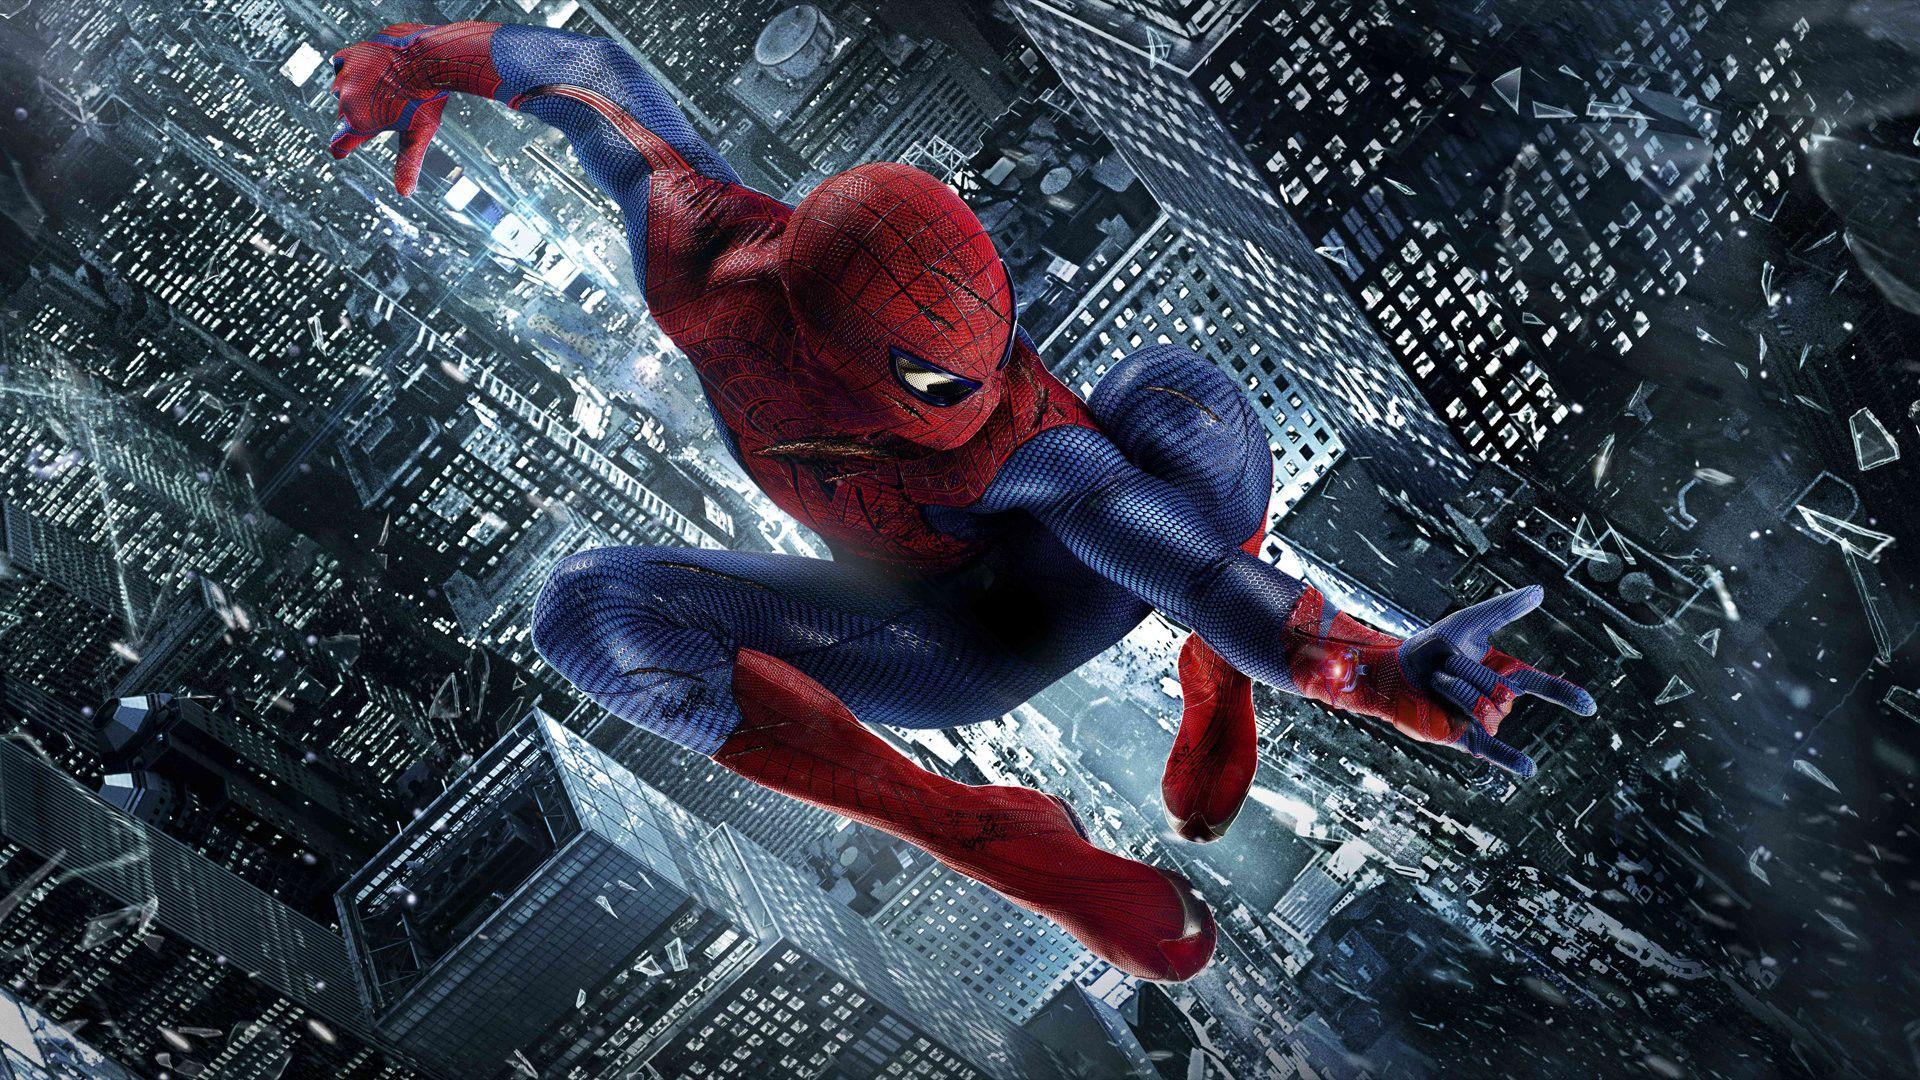 1920x1080 The Amazing Spider Man Hd Wallpapers Desktop Backgrounds The 1920a 1080 Spiderman Wallpaper Hd Man Wallpaper Amazing Spiderman Spiderman